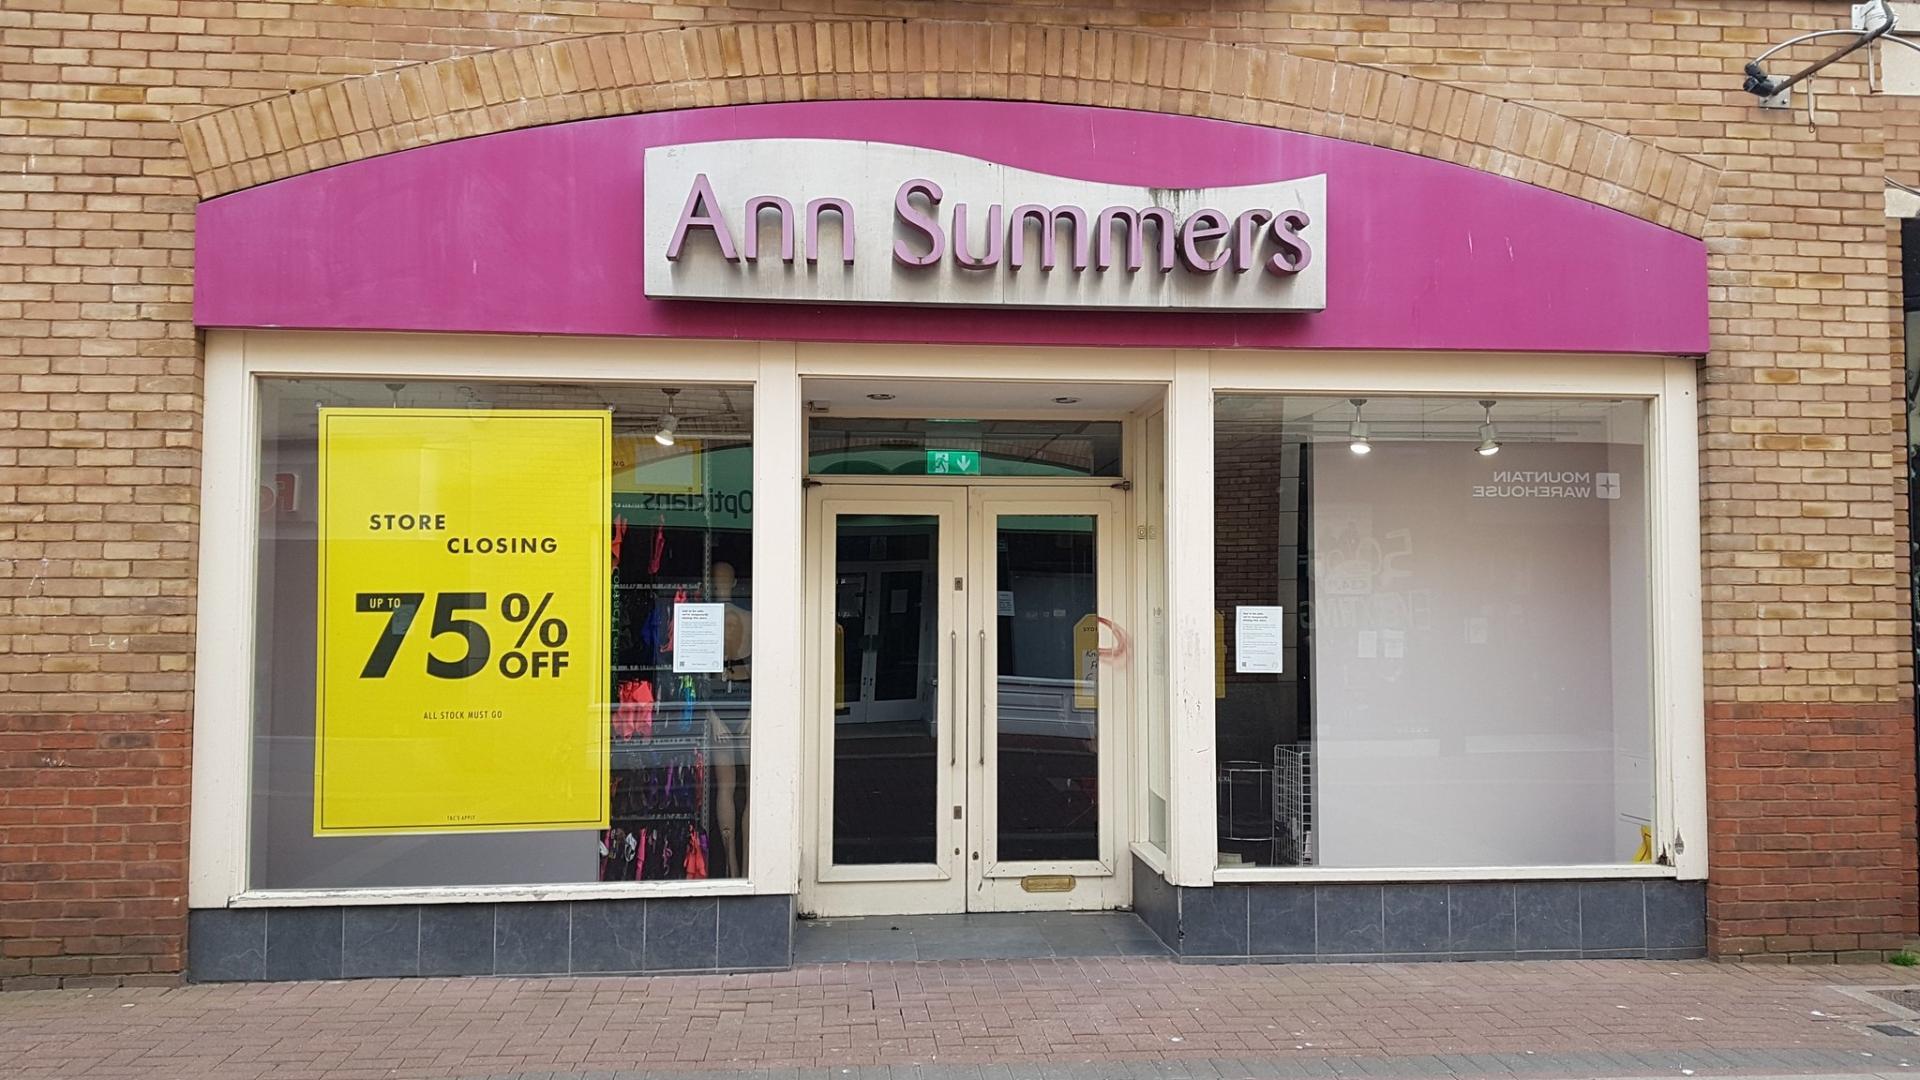 Lionel Green Street entregar Búsqueda  Sex toy and lingerie shop in Limerick shuts down - Limerick Leader